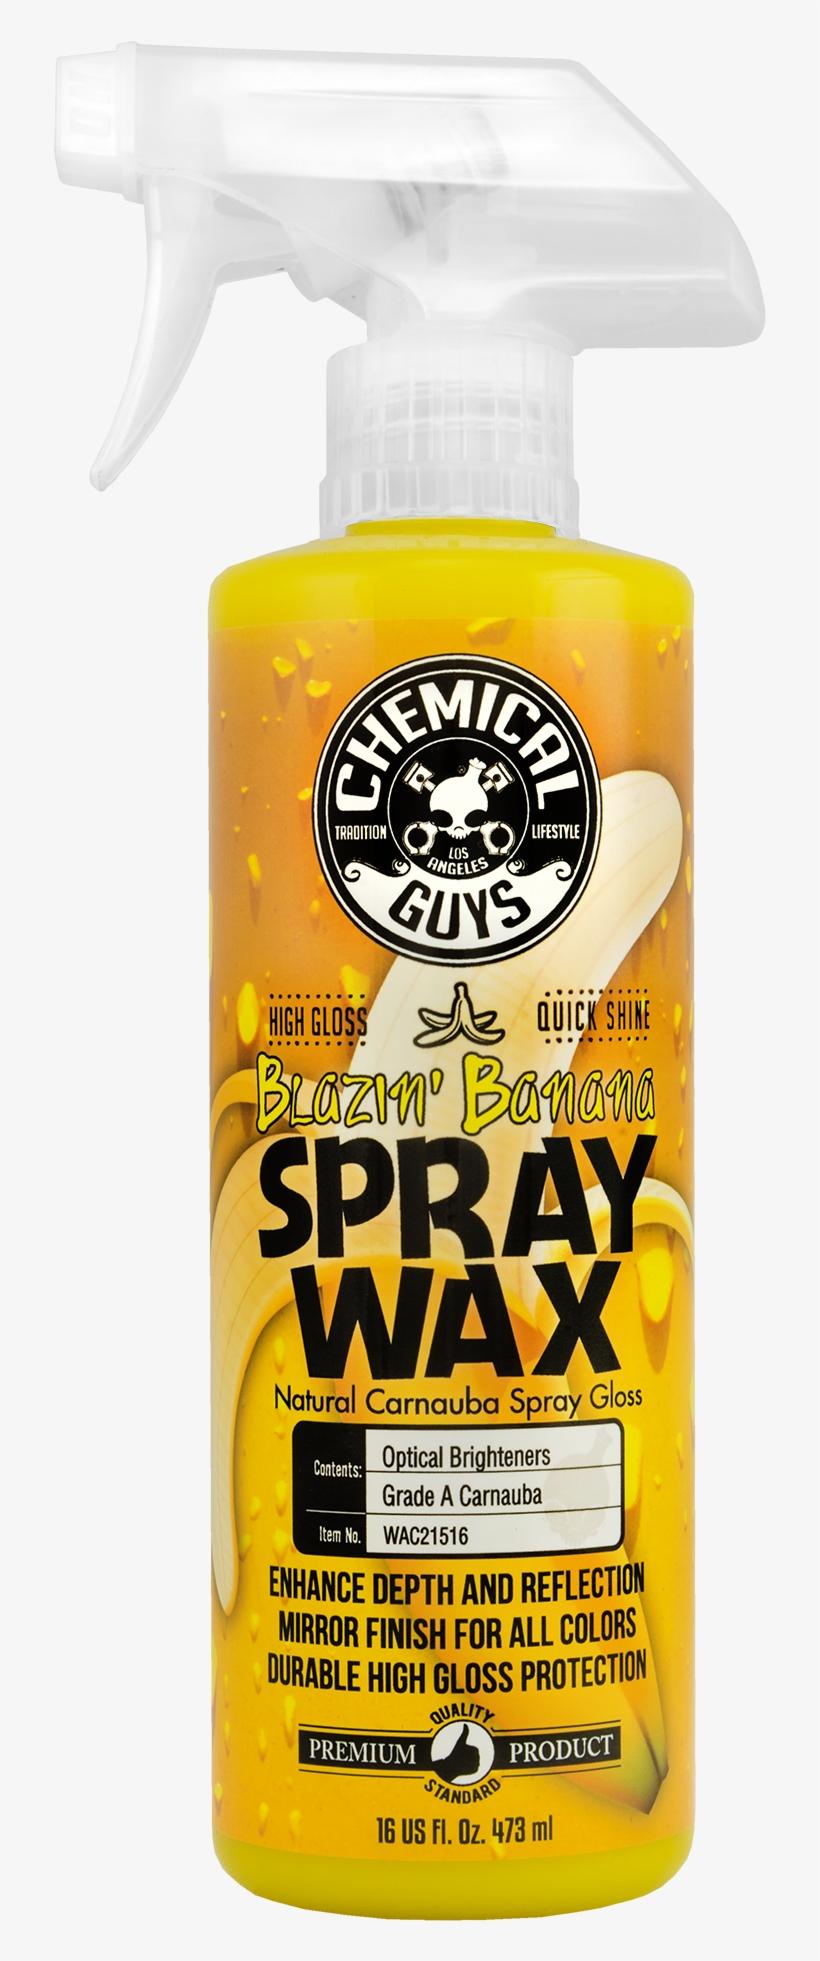 Chemical Guys Banana Wax Transparent PNG - 2000x2000 - Free Download